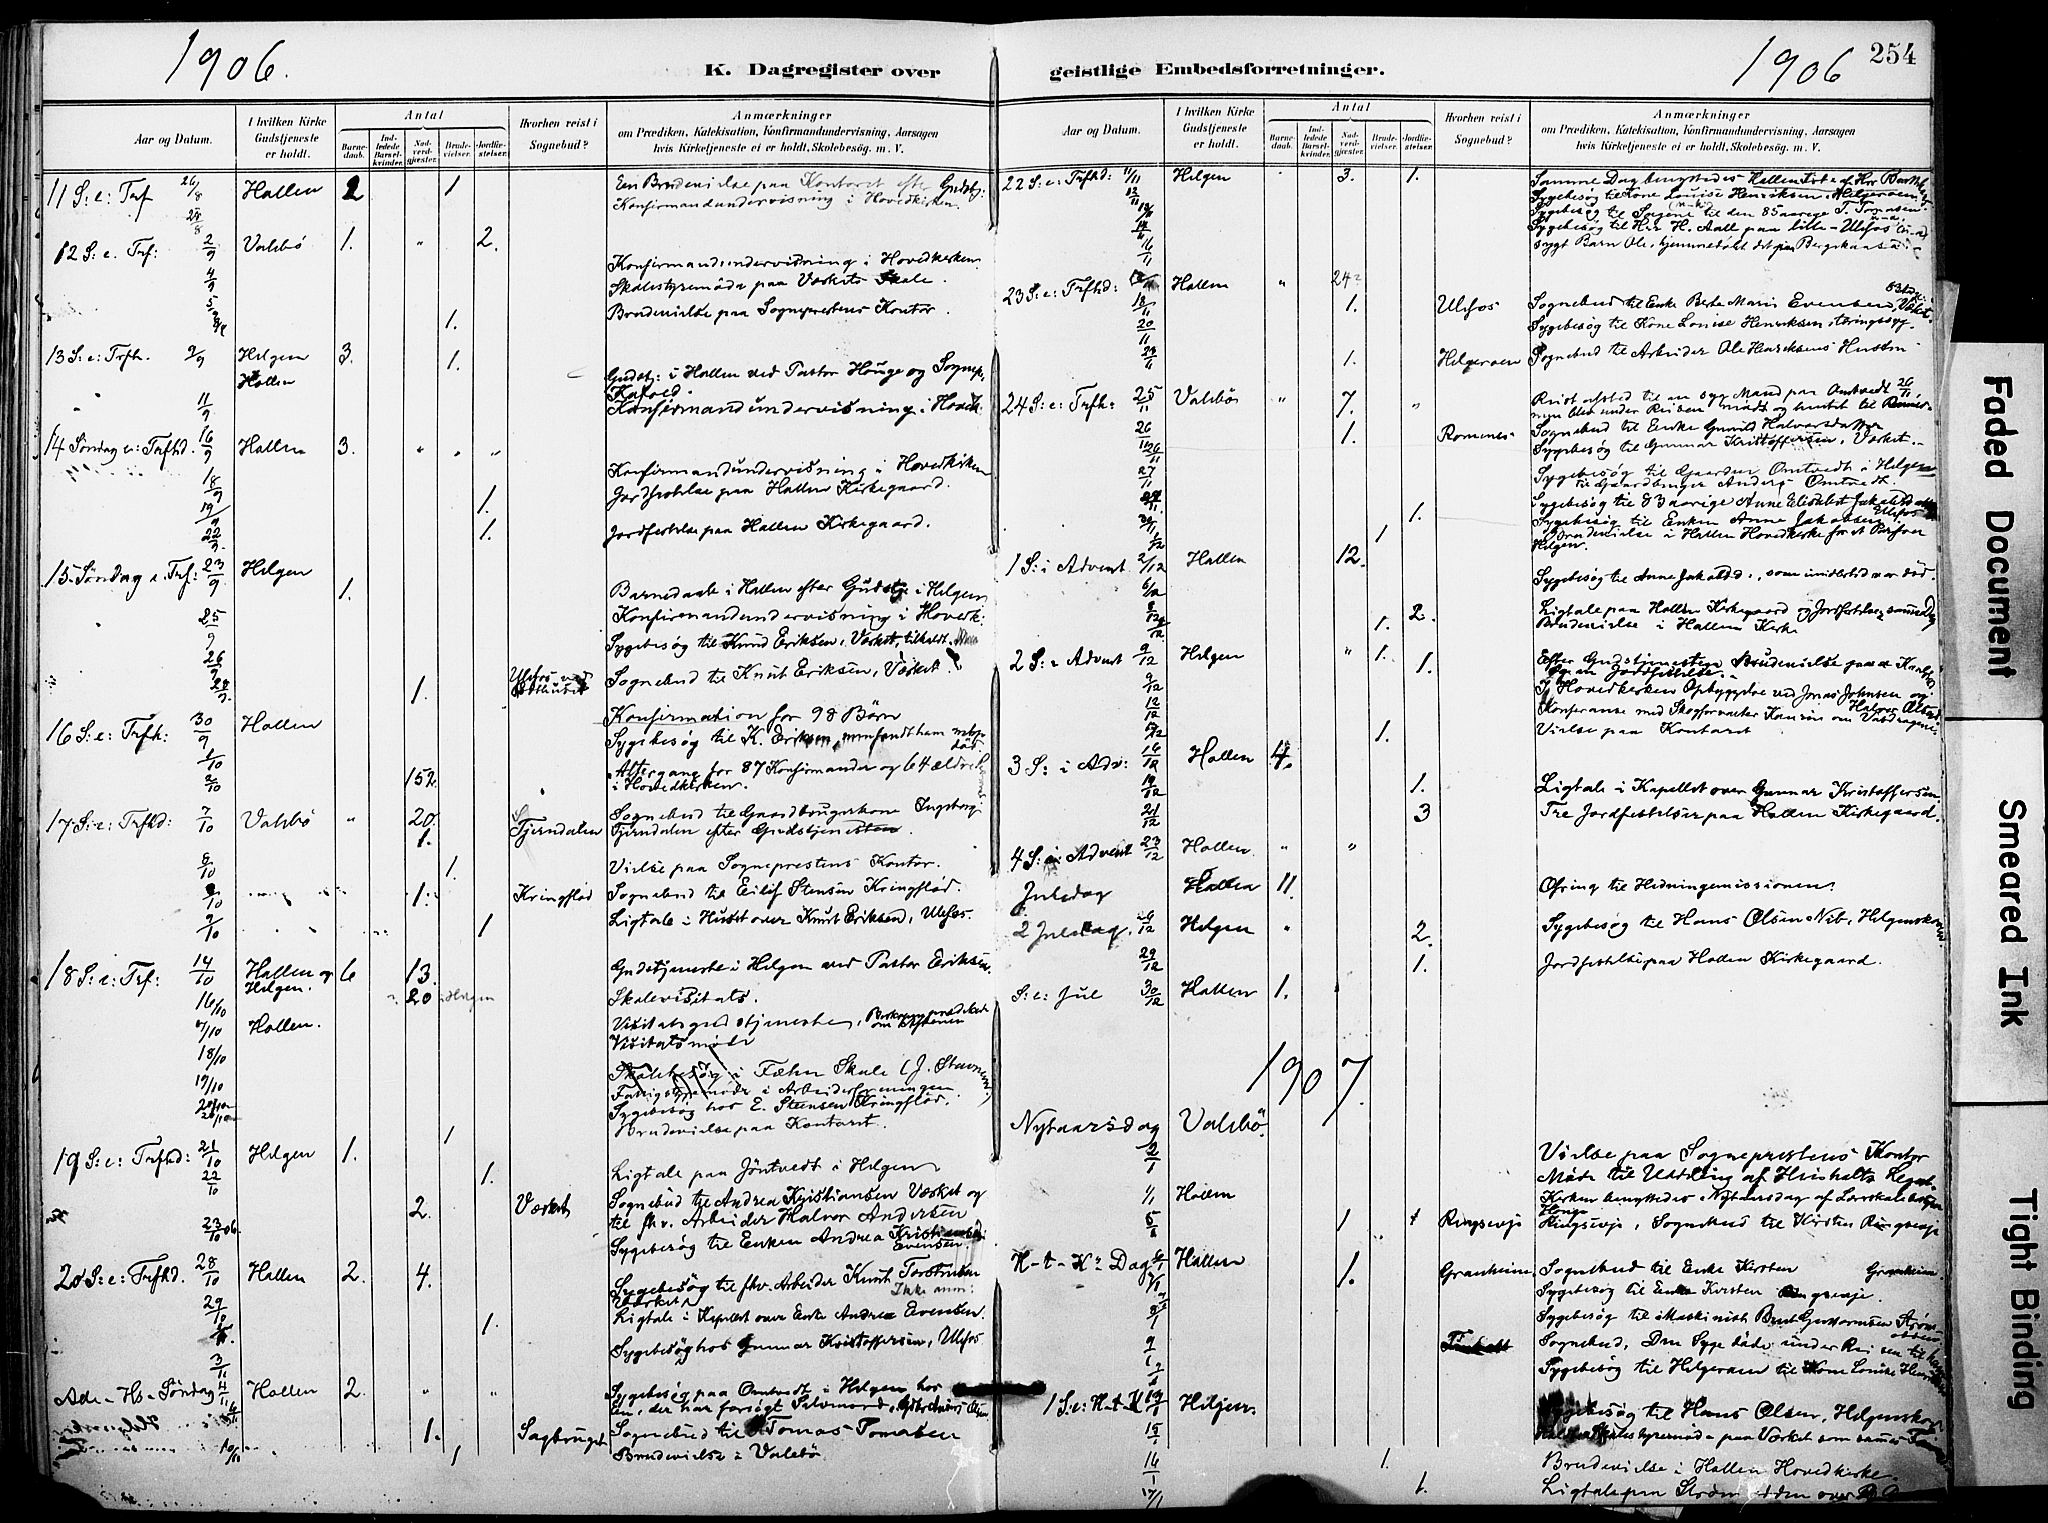 SAKO, Holla kirkebøker, F/Fa/L0010: Ministerialbok nr. 10, 1897-1907, s. 254